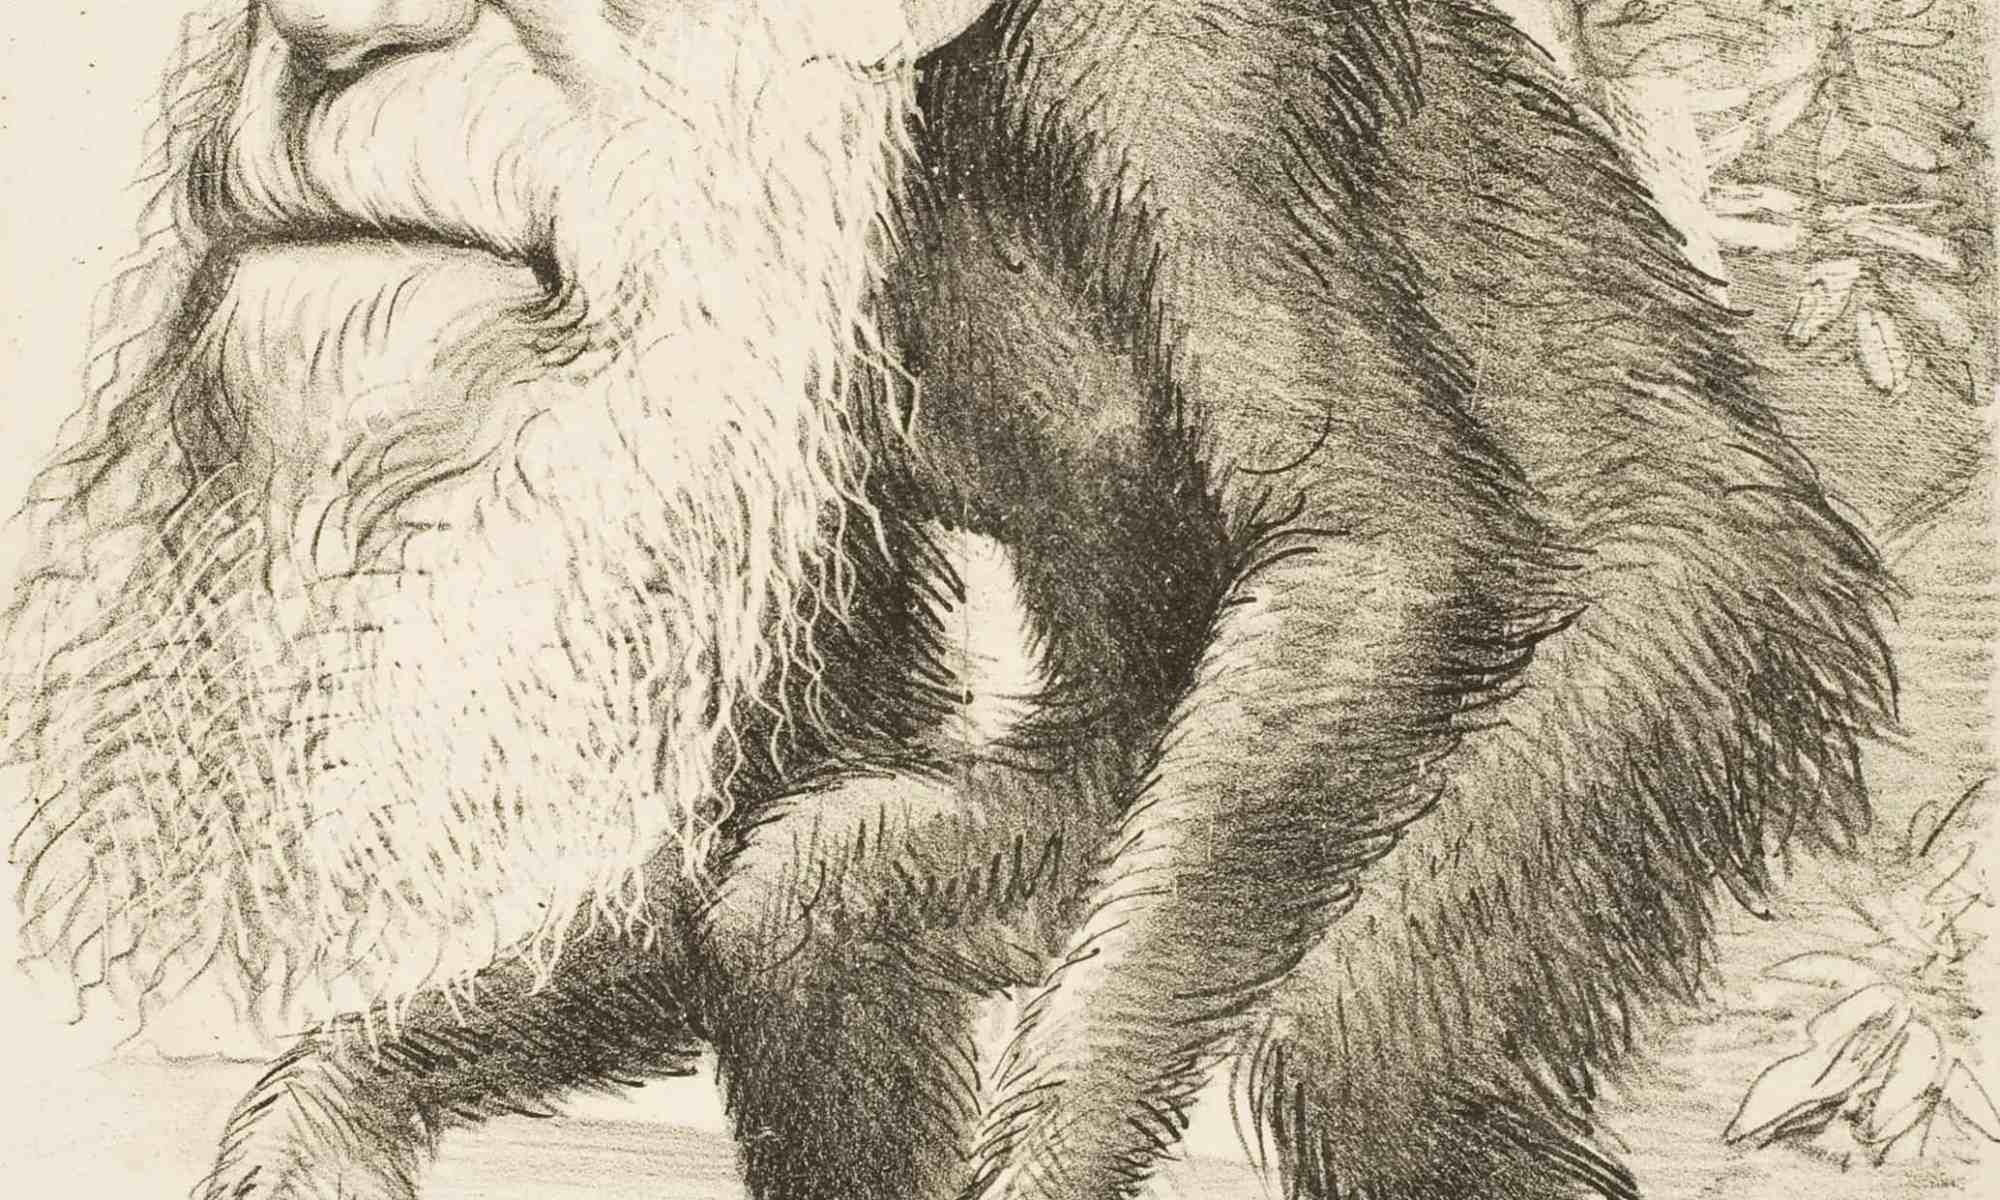 ▷ Formas de selección natural (muy políticamente incorrecto) 1